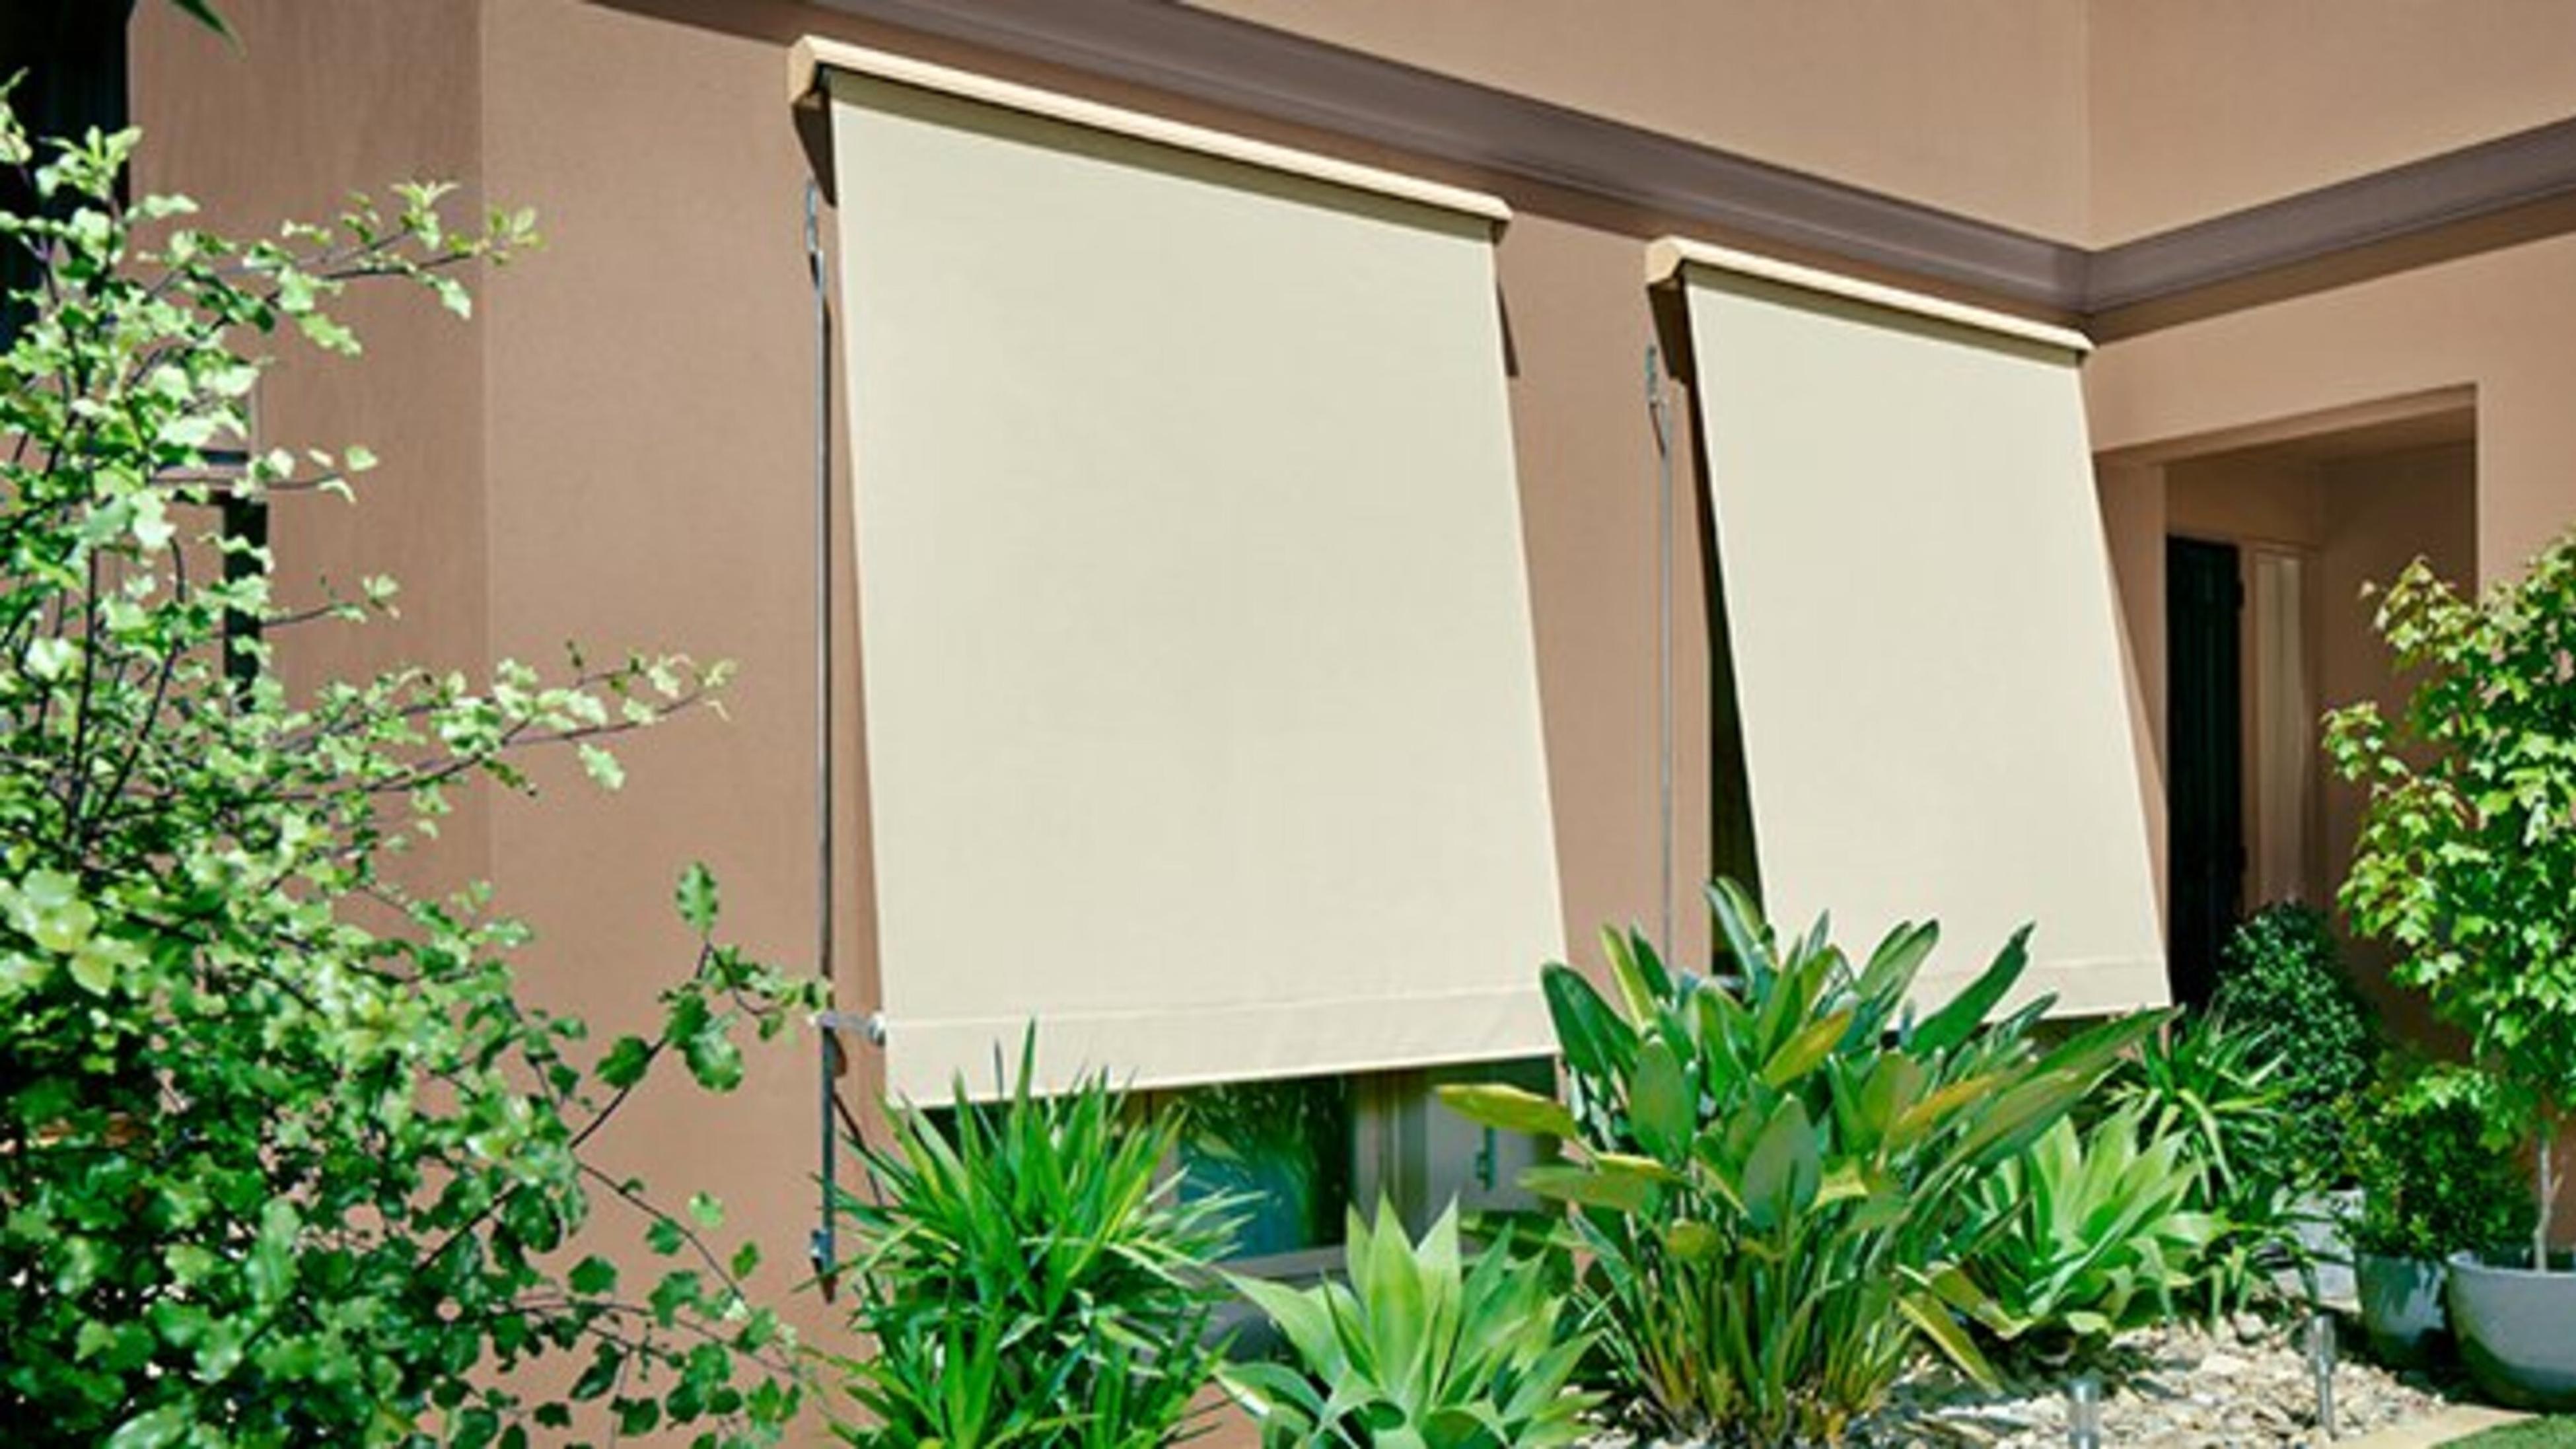 Outdoor blinds and garden area.